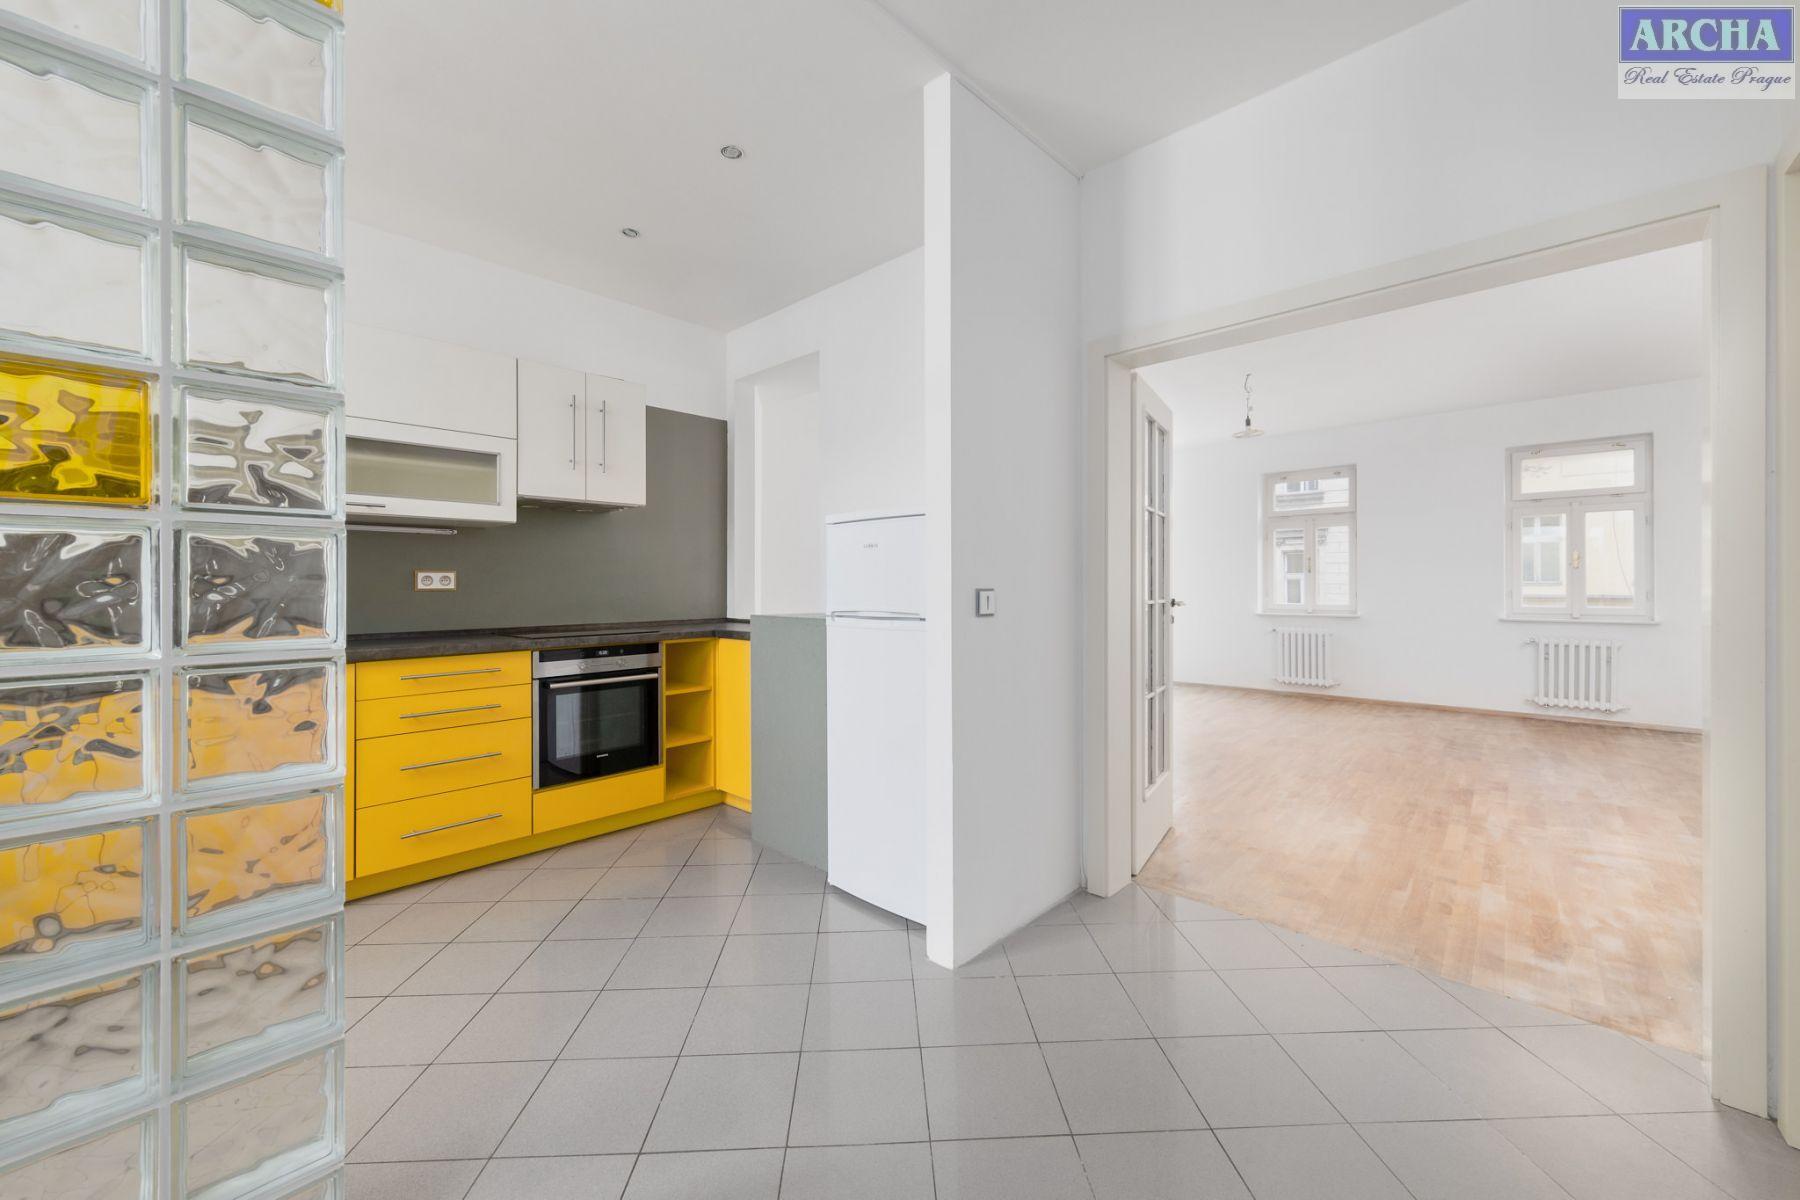 Nájem bytu 3+1, 110 m2,  teresa,  4. NP,  Letohradská,  Praha 7